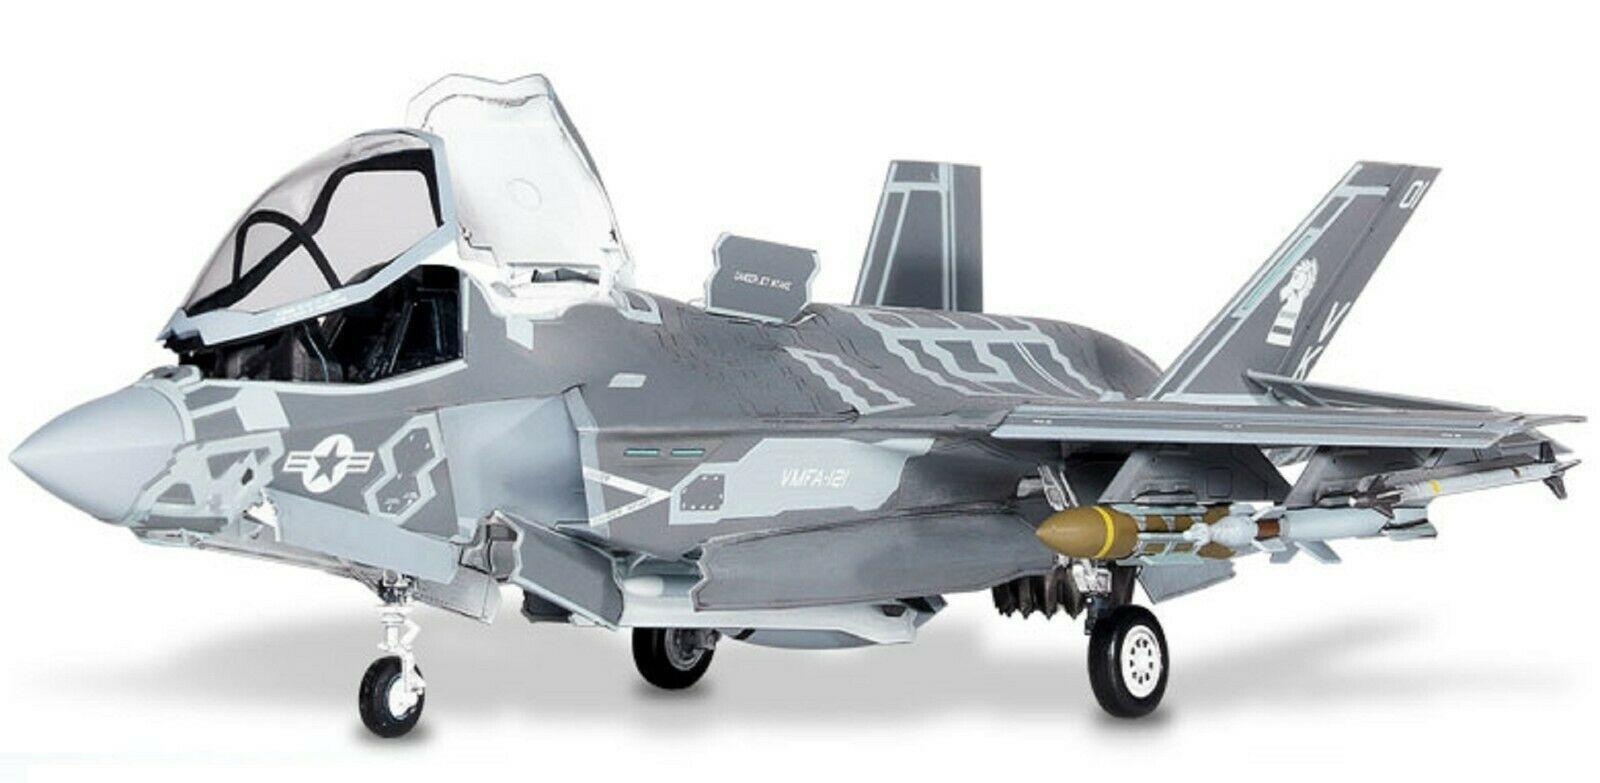 Academy 12569 USMC F-35B VMFA-121 Green Knights Plamodel Plastic Hobby Model